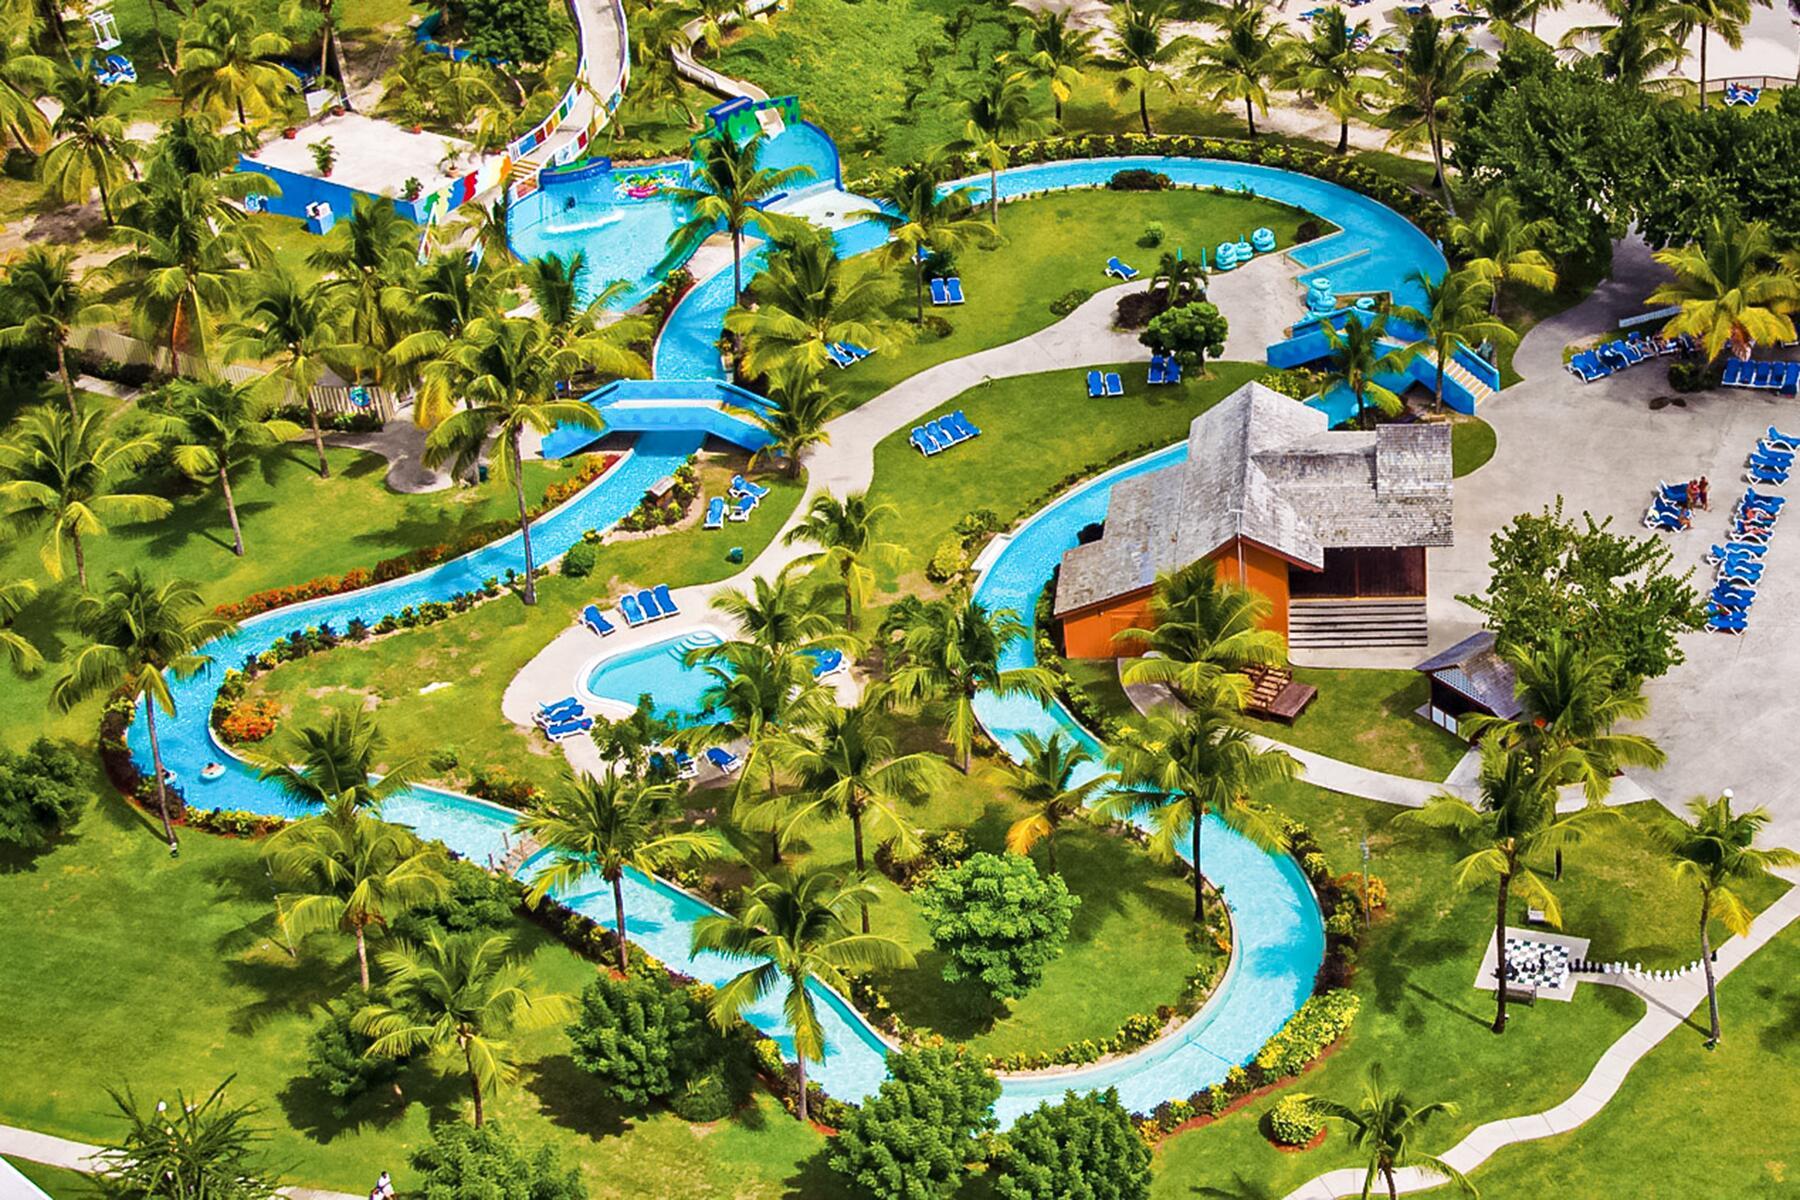 07_LazyRiverAdults__CoconutBayBeach_7.) waterpark-aerial